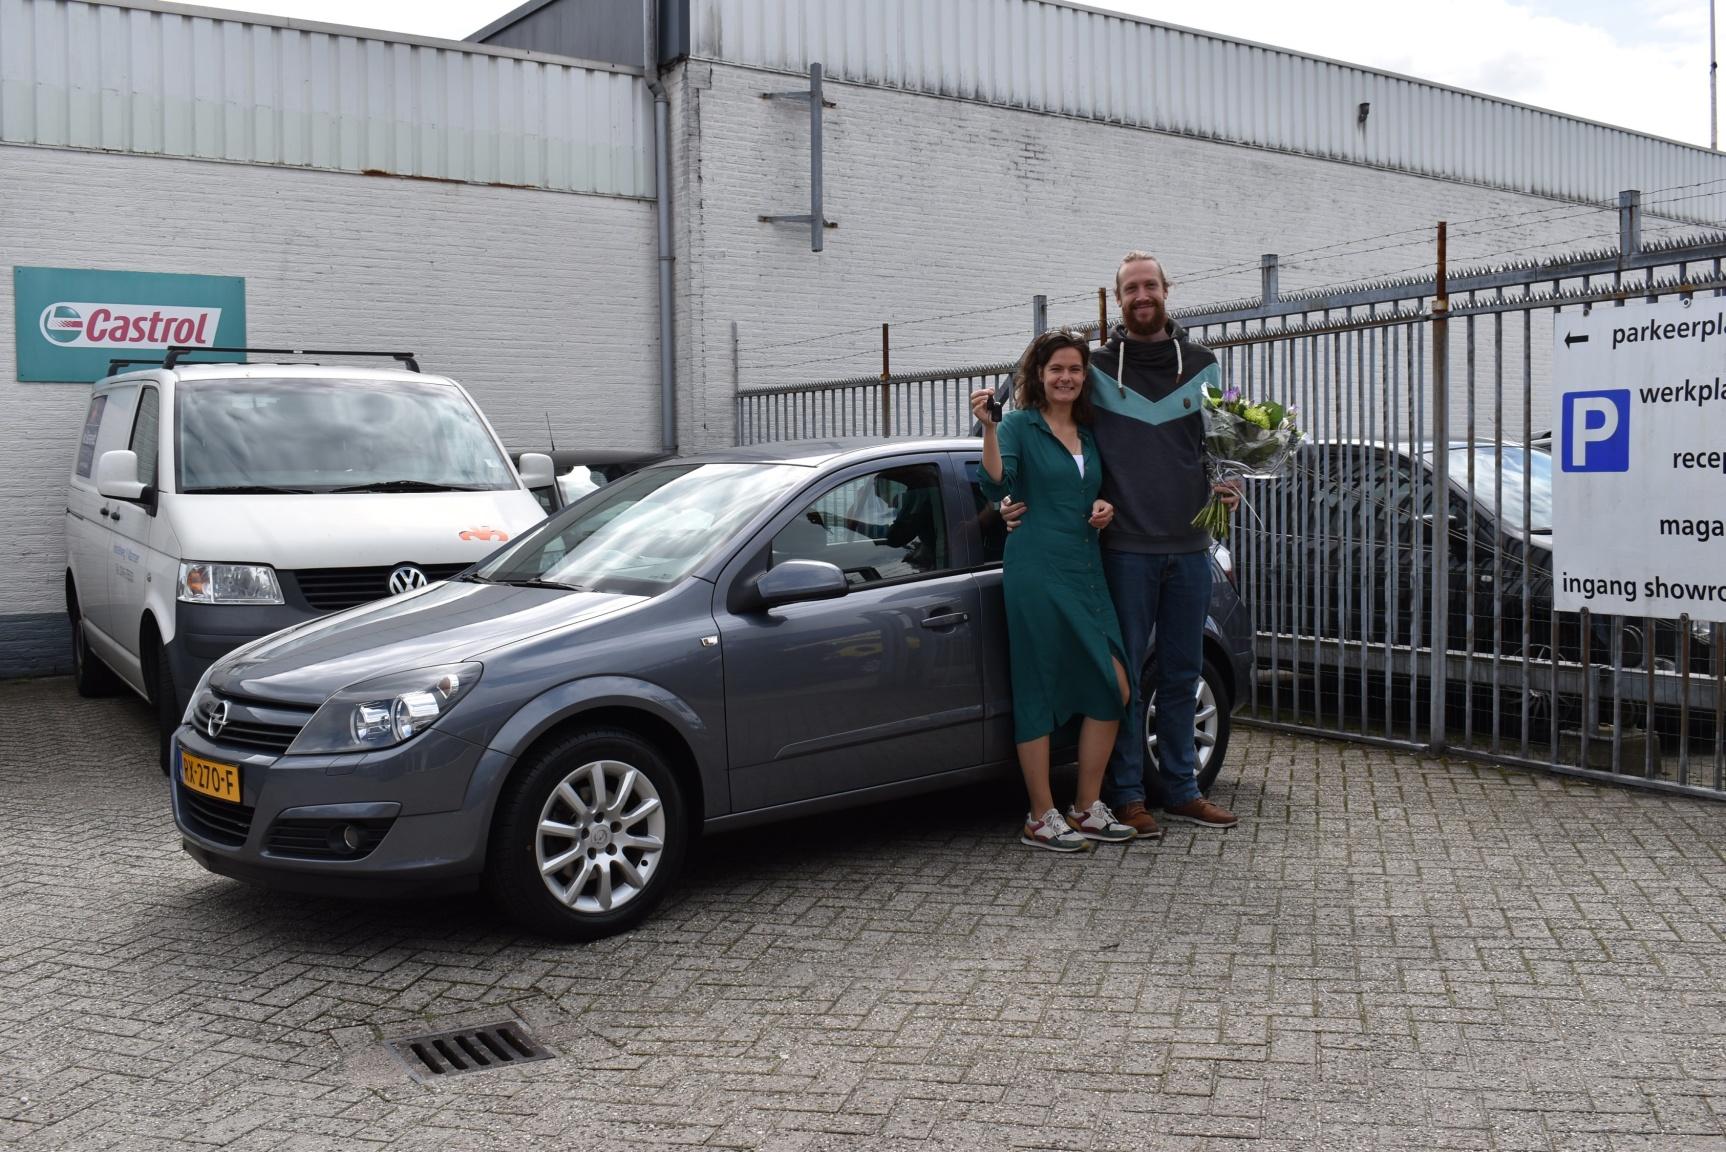 Aflevering Opel Astra-2021-08-31 08:10:42